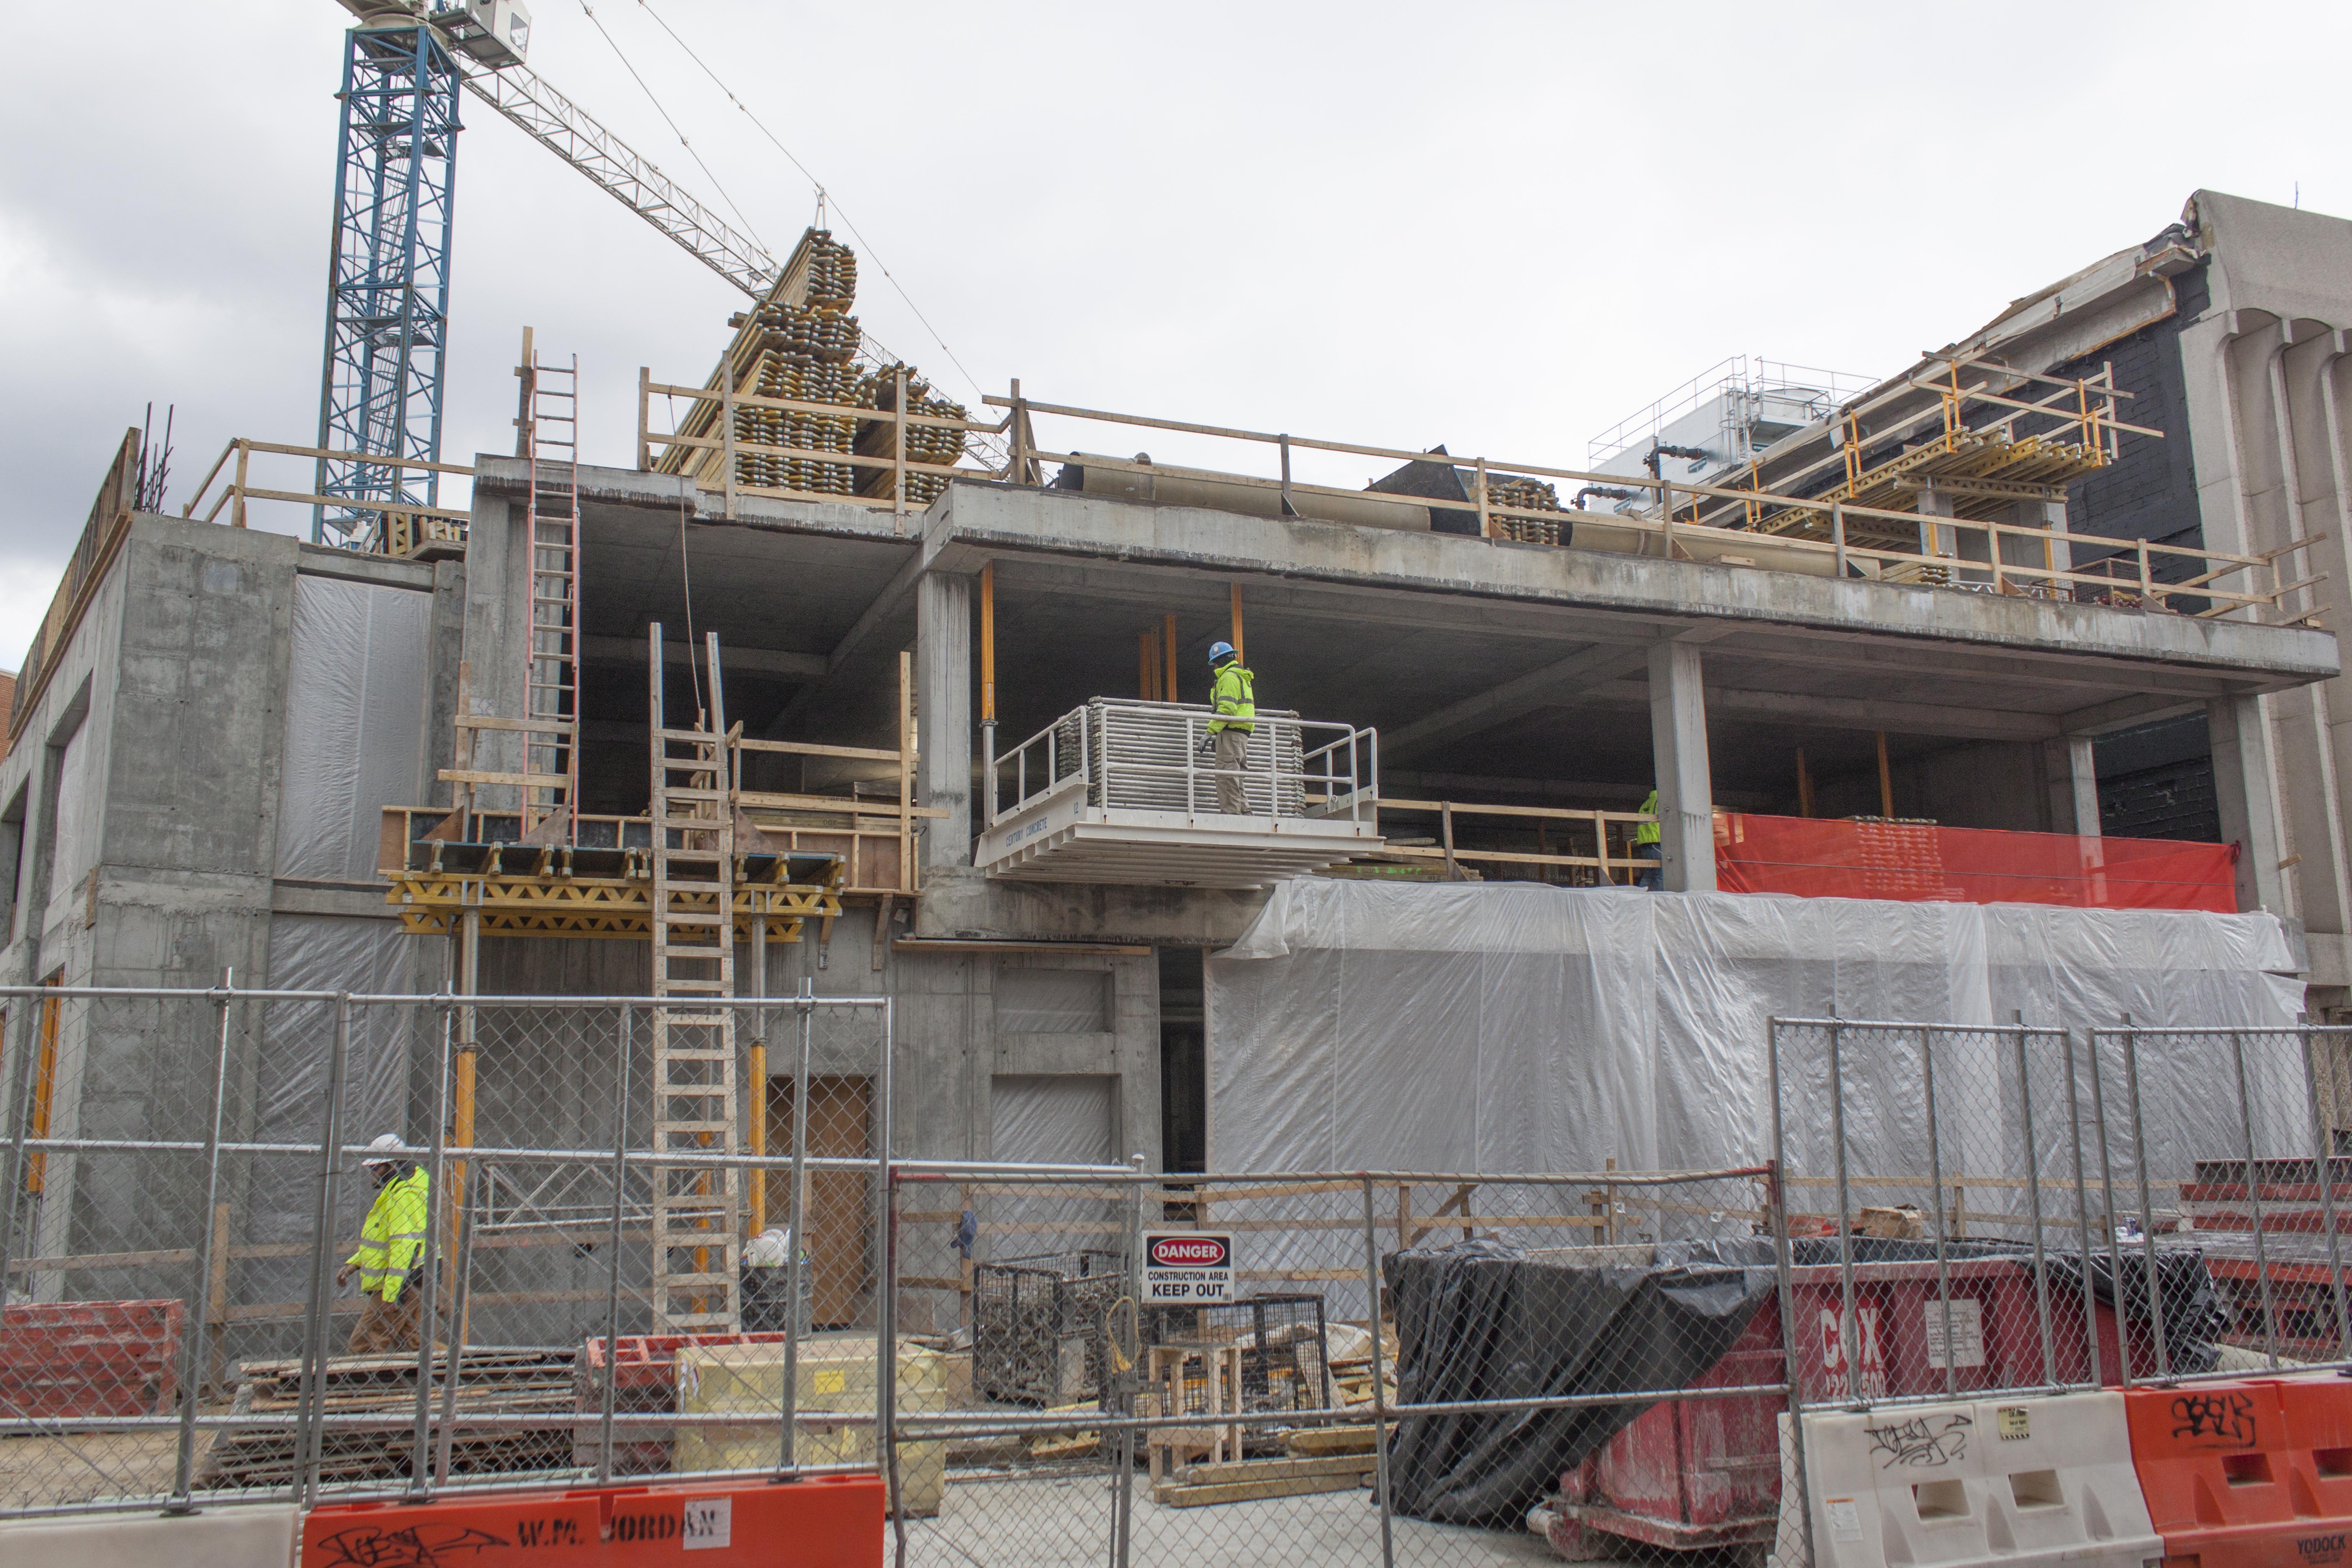 VCU renovations January (16505982702).jpg January Date 30 January 2015, 14:05 Source January Author VCU Libraries from Richmond, VA, USA